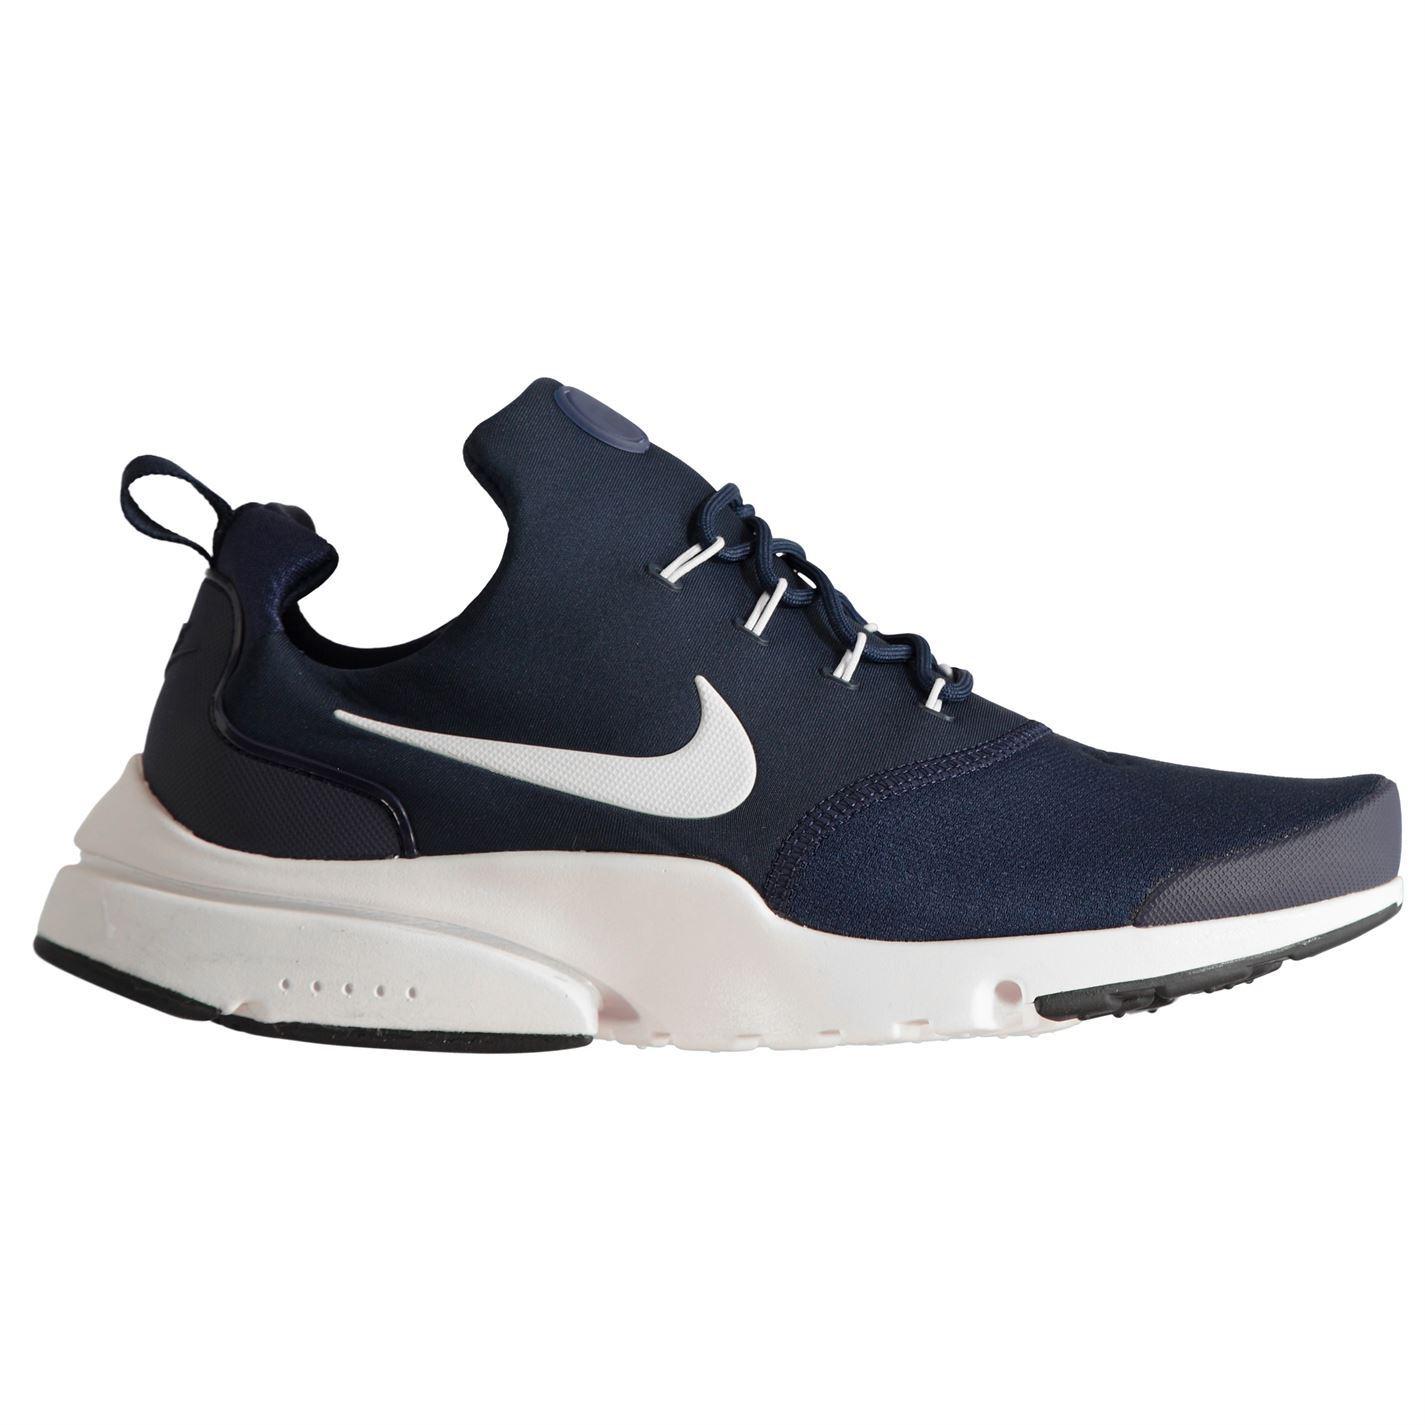 Nike Presto Fly Mens Trainers Shoes Running Footwear